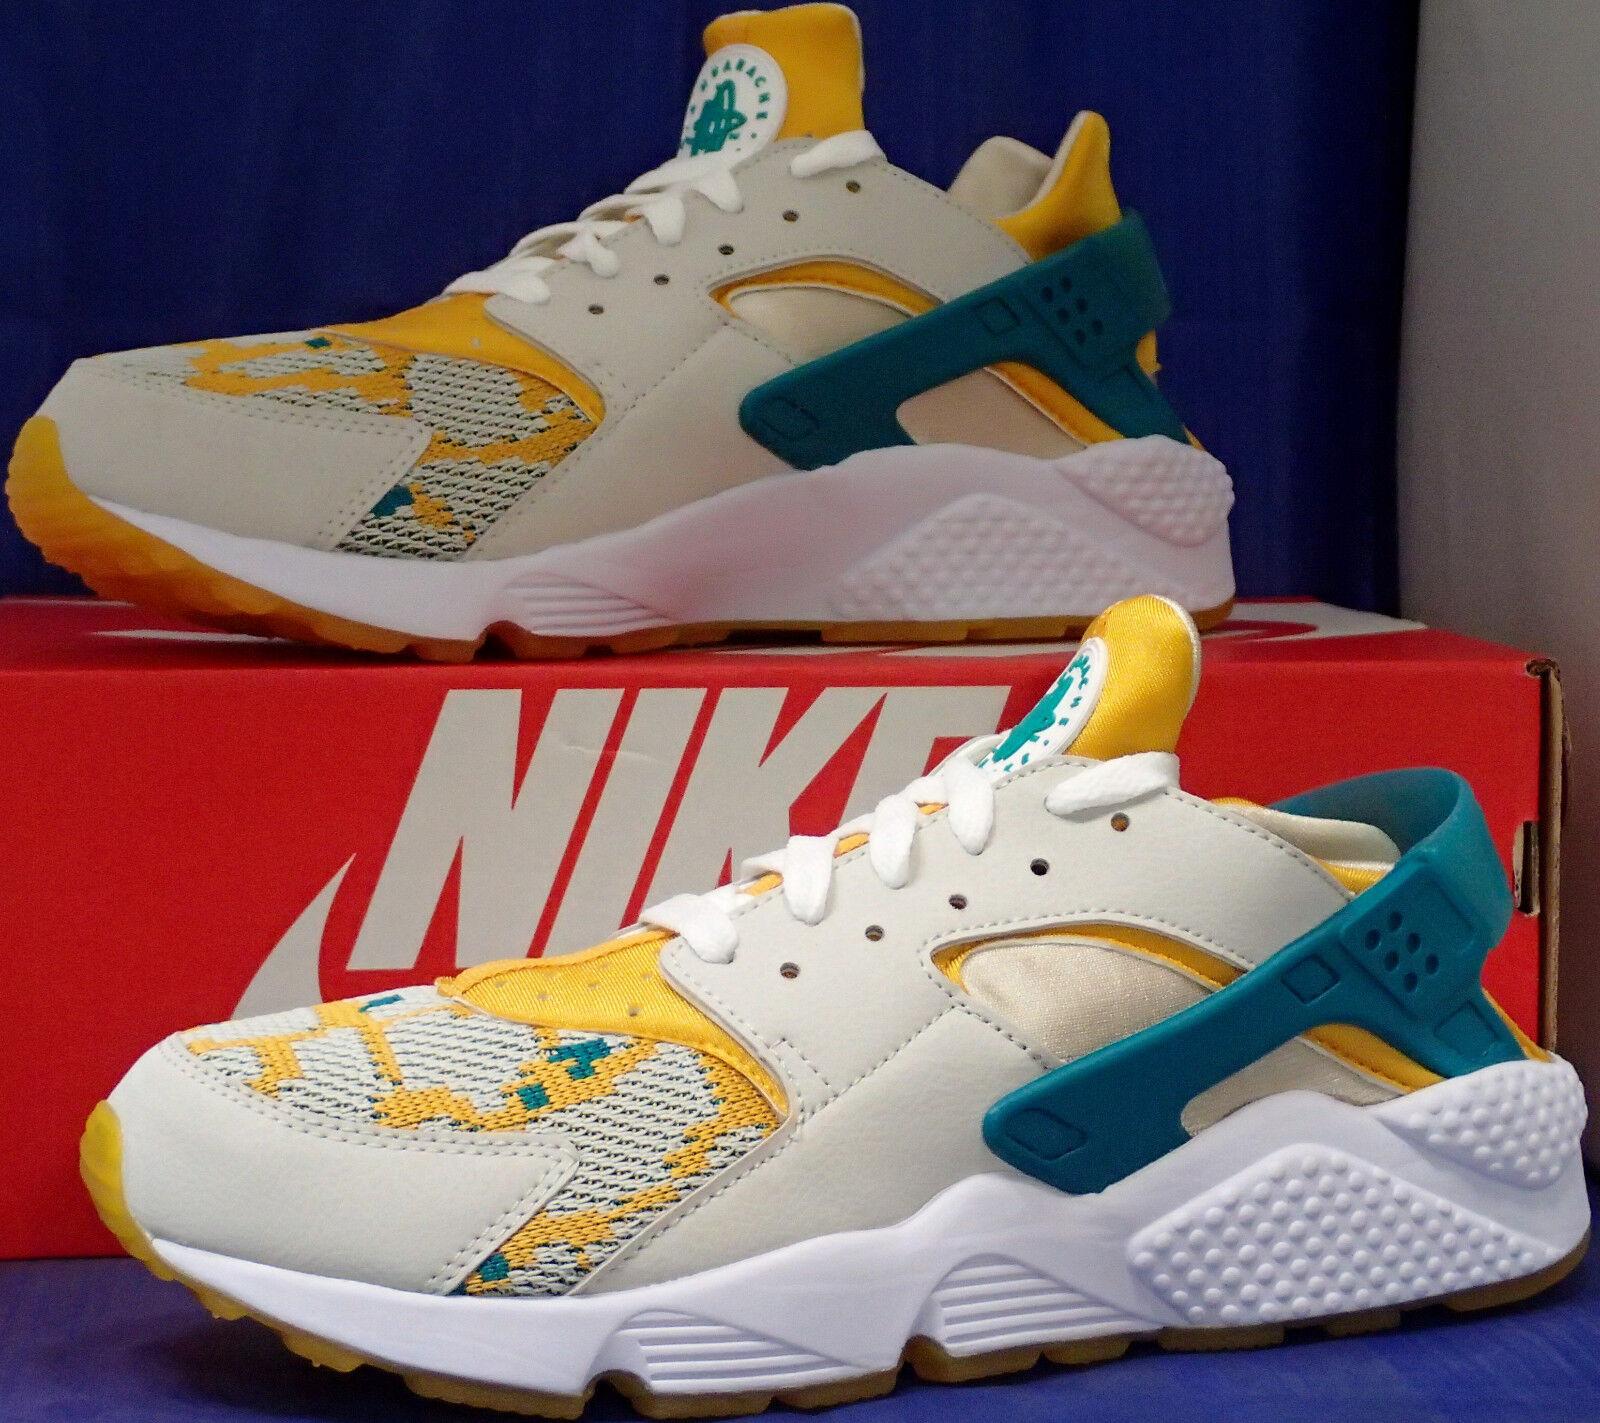 Nike Aire Huarache Run pa Claro Claro Claro Hueso Radiante Esmeralda Dorado Talla 10.5 e9effc